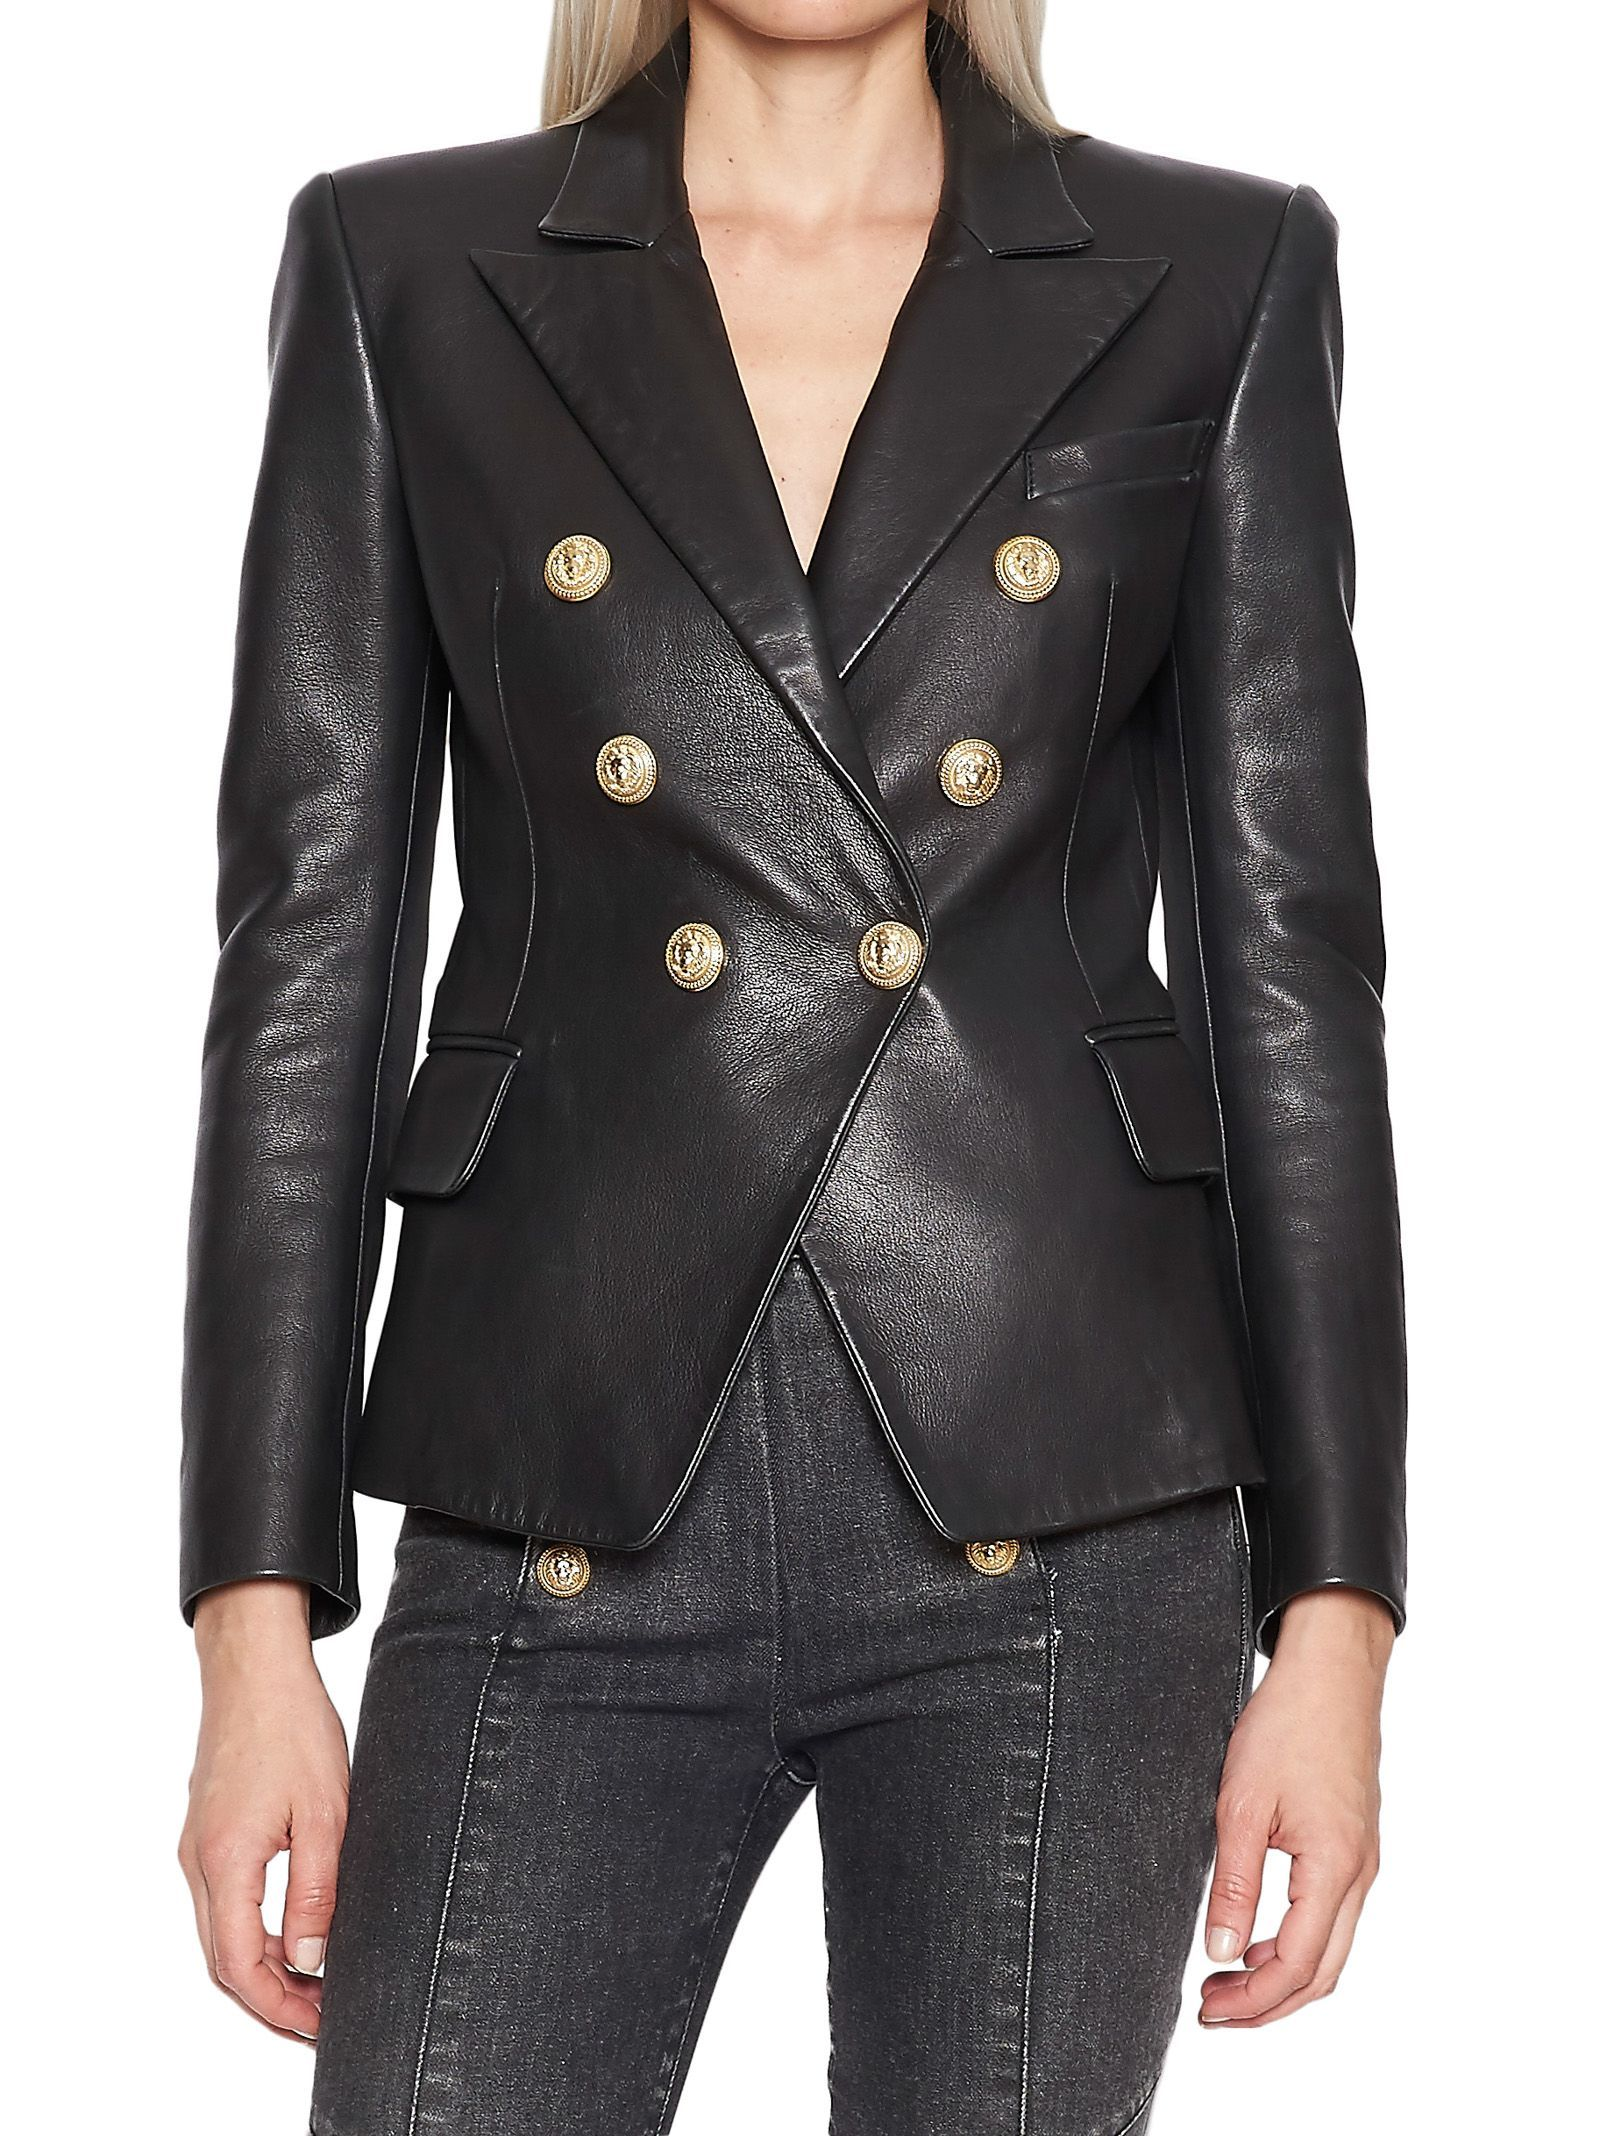 Balmain Jacket Balmain Cloth Blazer Designs Leather Blazer Black Faux Leather Jacket [ 2136 x 1600 Pixel ]